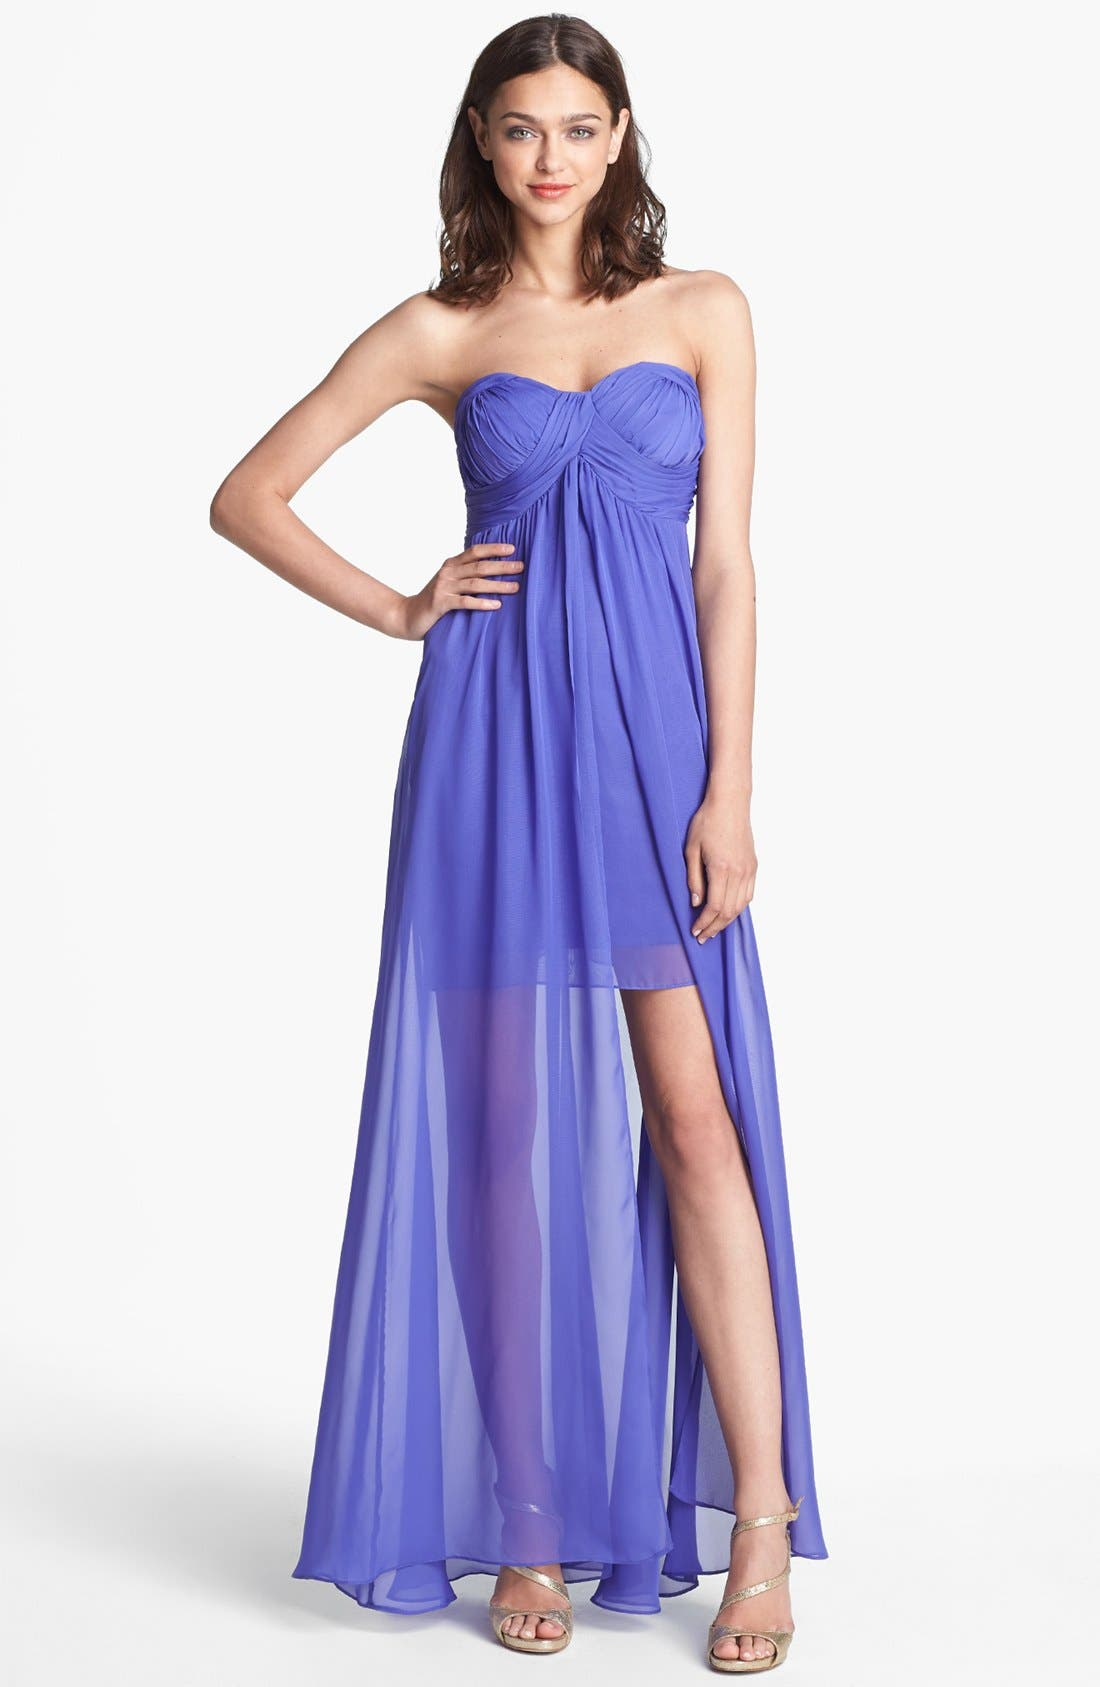 Main Image - Hailey by Adrianna Papell Flyaway Chiffon Dress